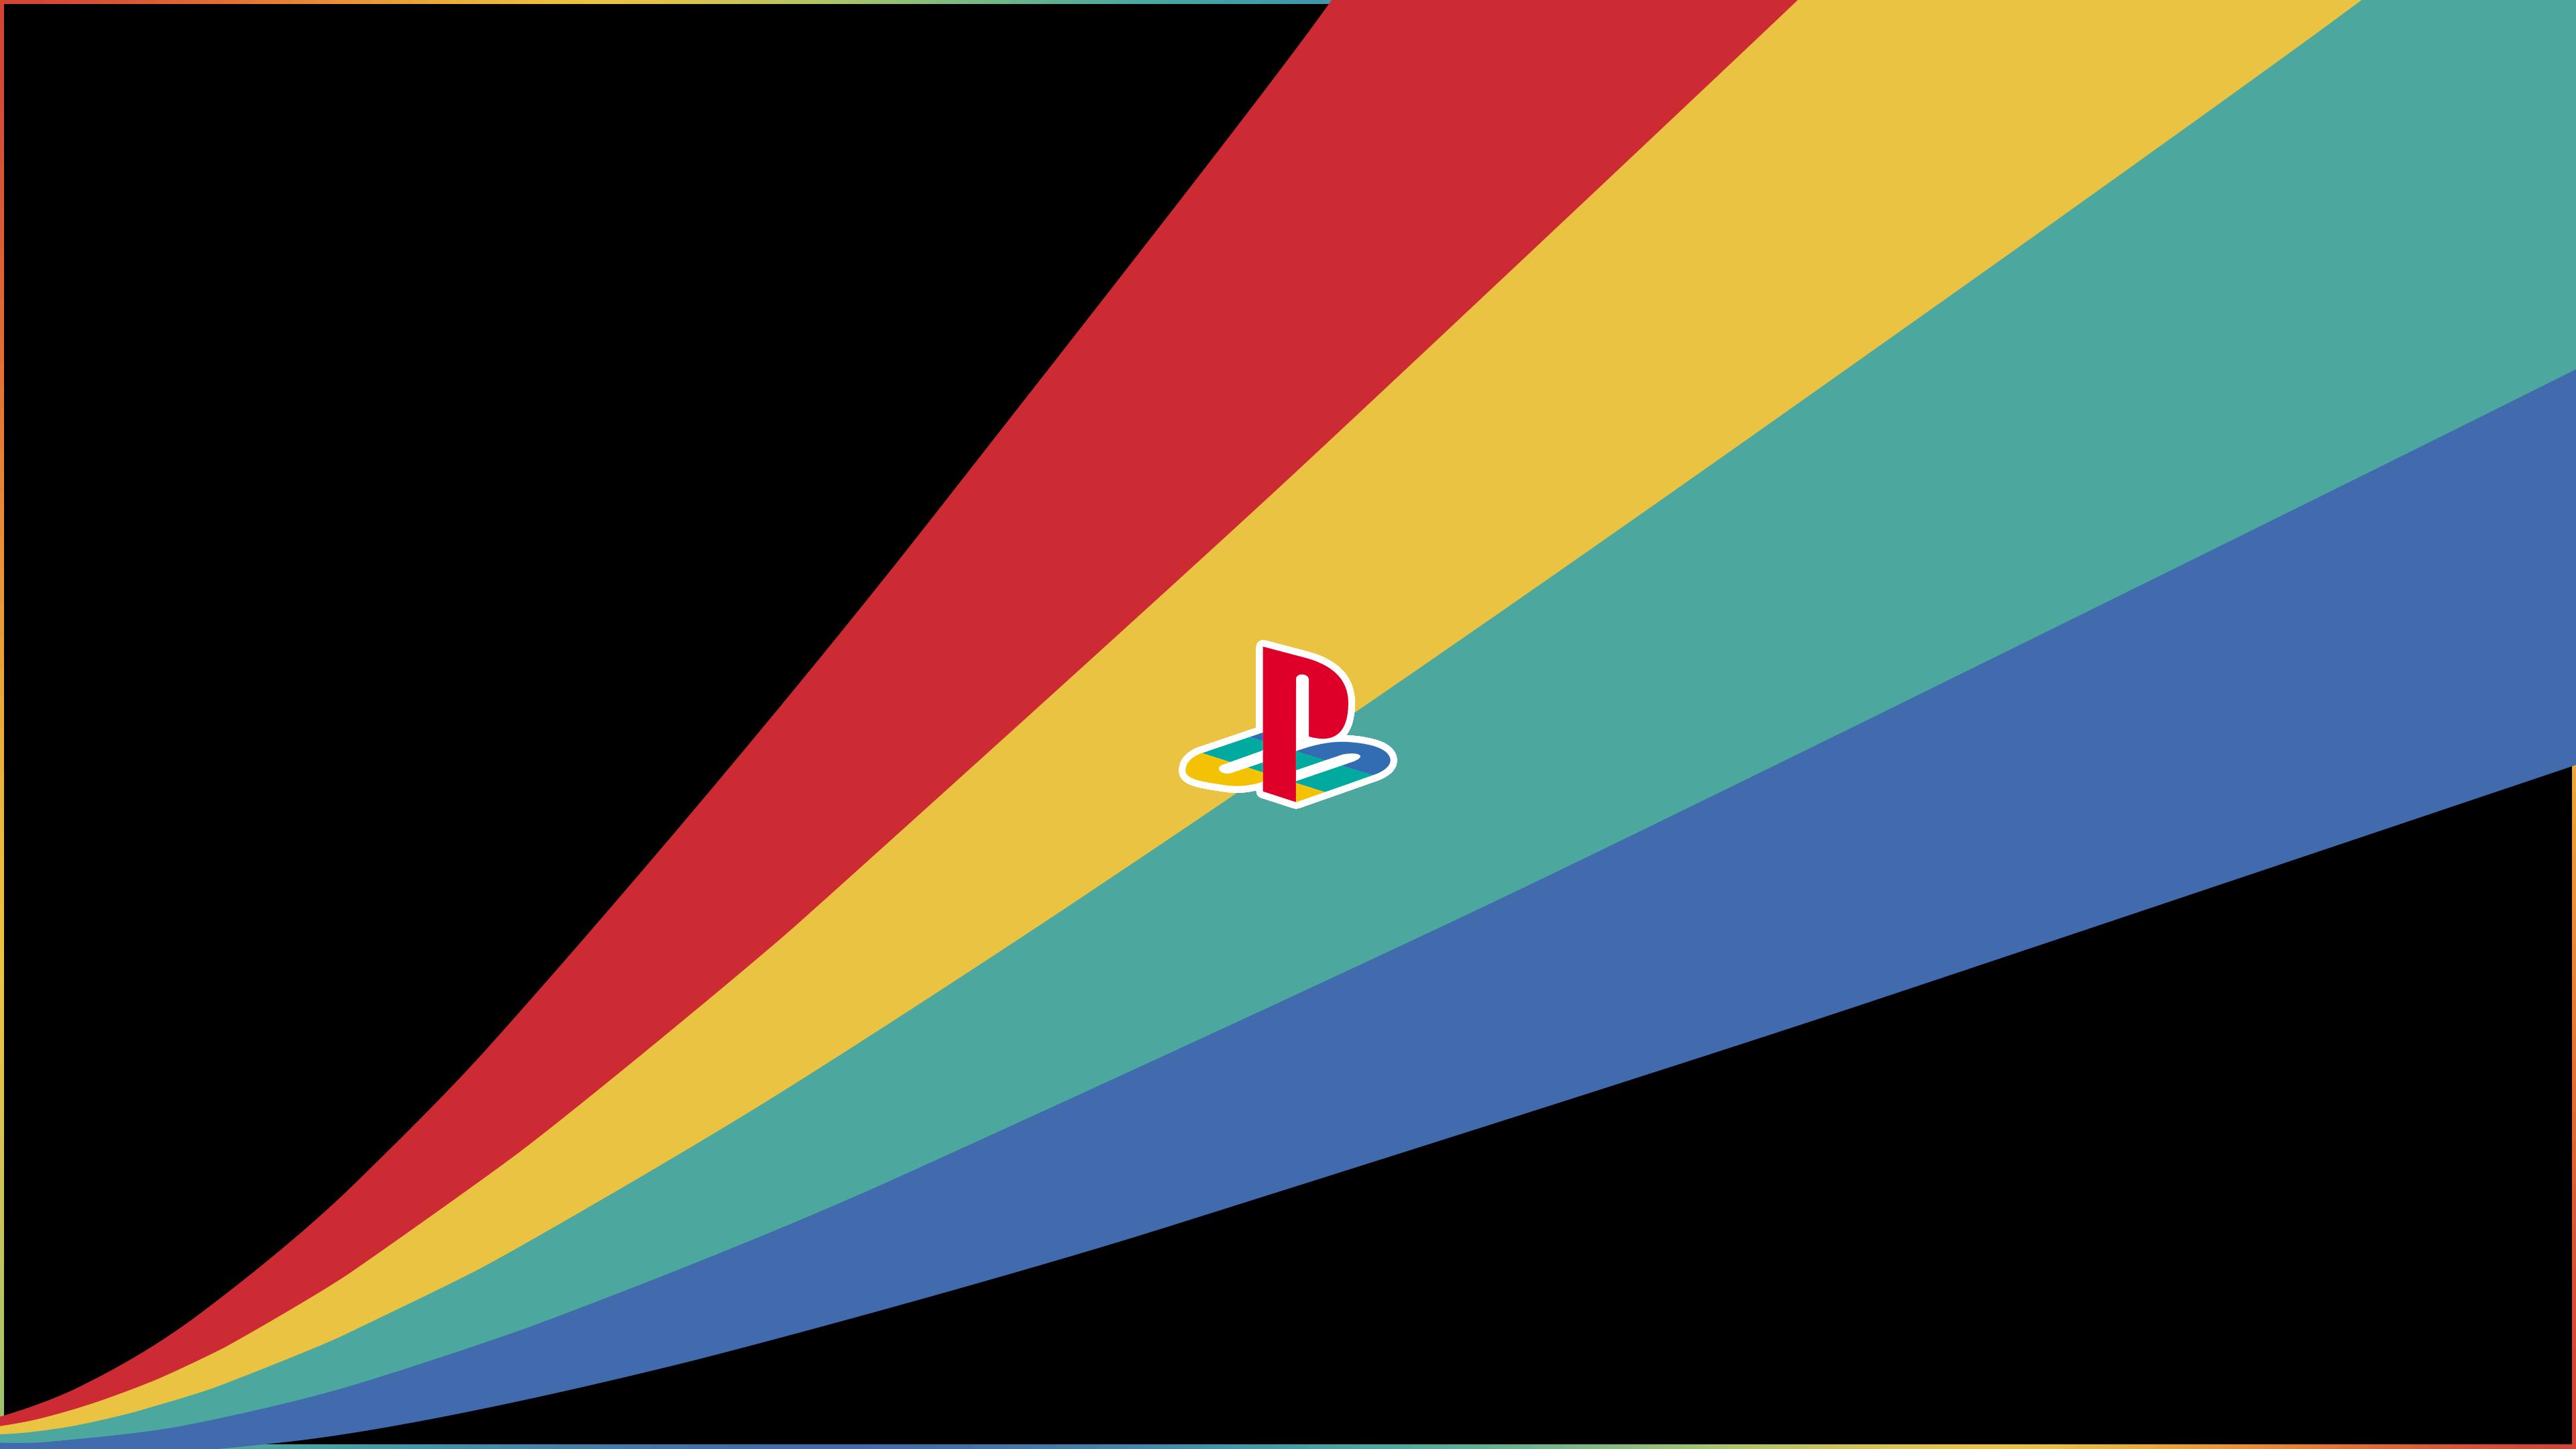 Retro PlayStation Wallpapers   Top Retro PlayStation 3840x2160